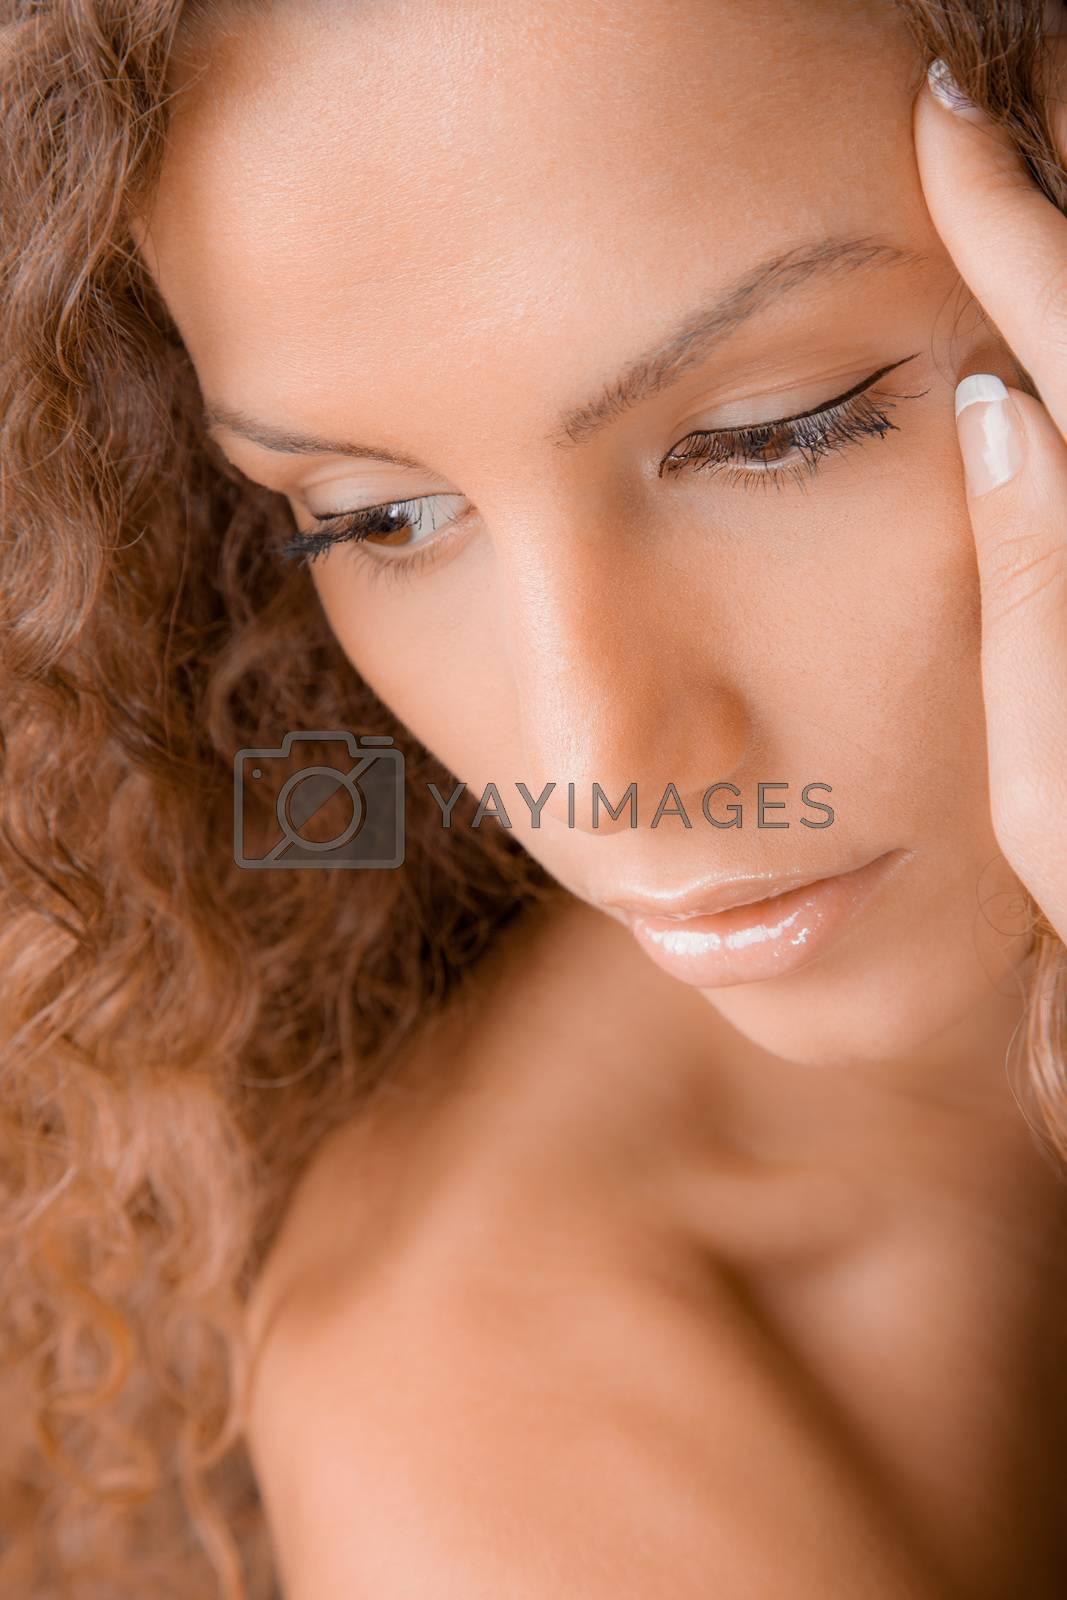 A close-up beauty portrait of a gorgeous young woman.